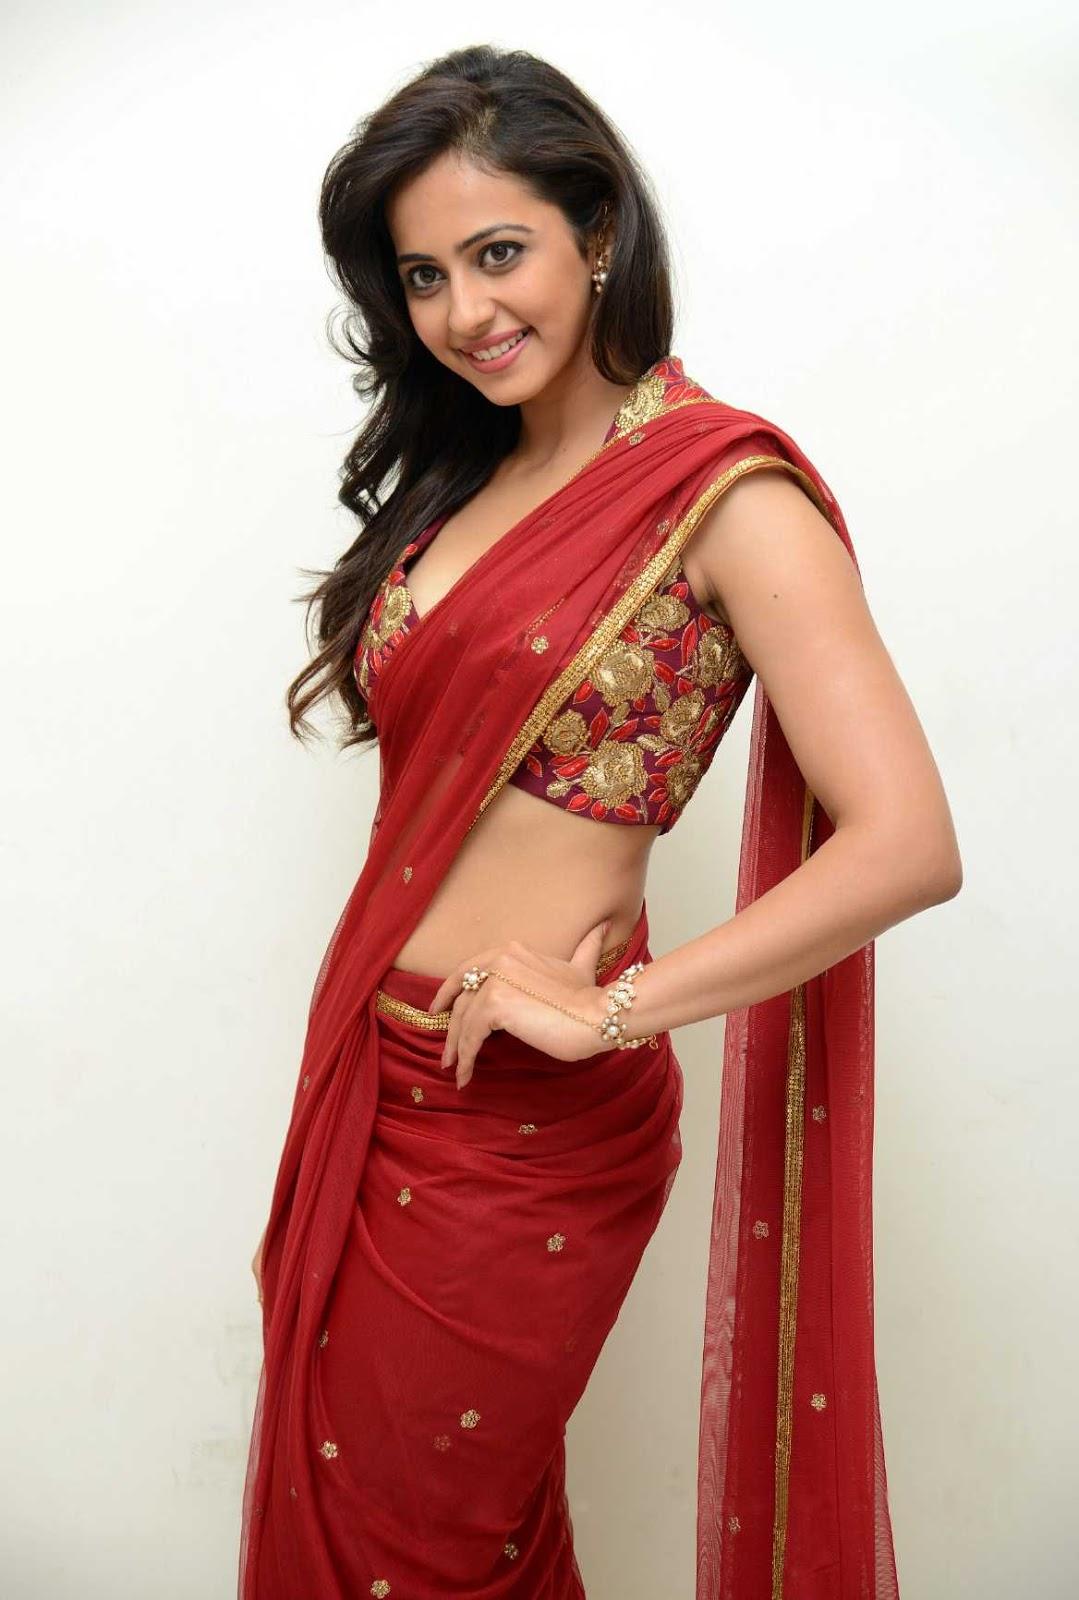 Rakul Preet Singh Latest Hot Glamourous Spicy Photoshoot -9133